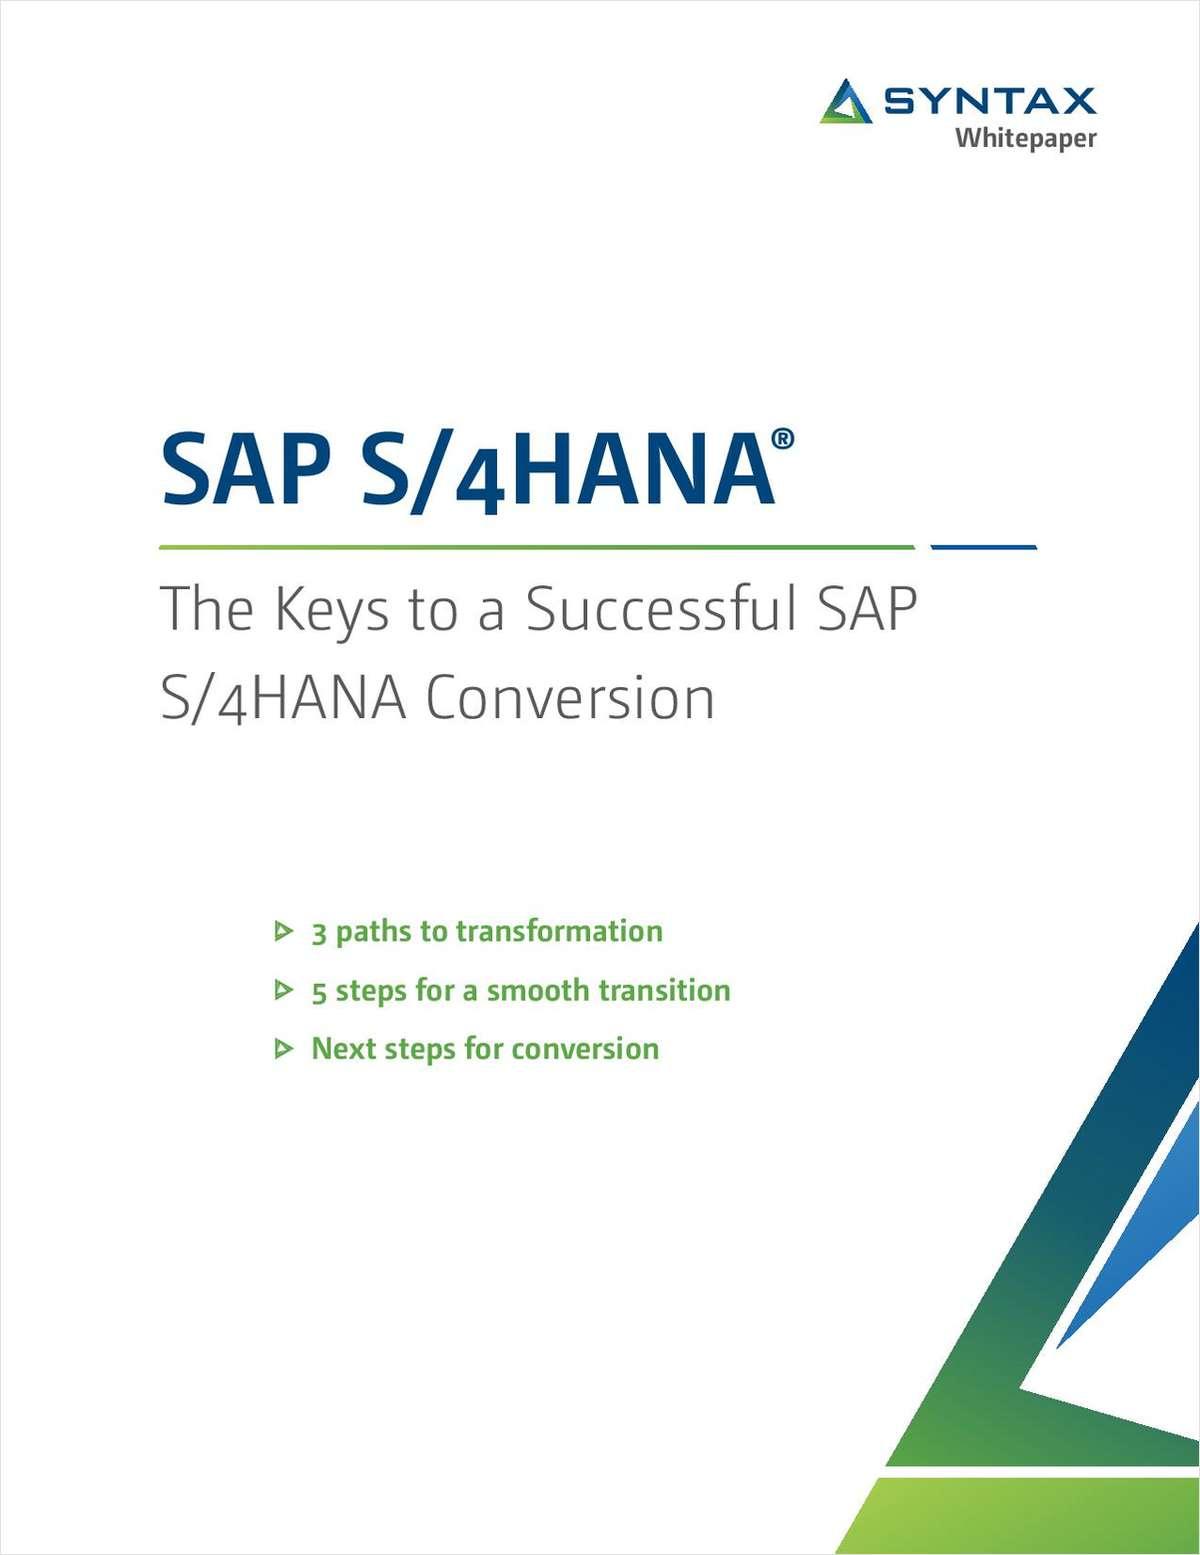 The Keys to a Successful SAP S/4HANA Conversion